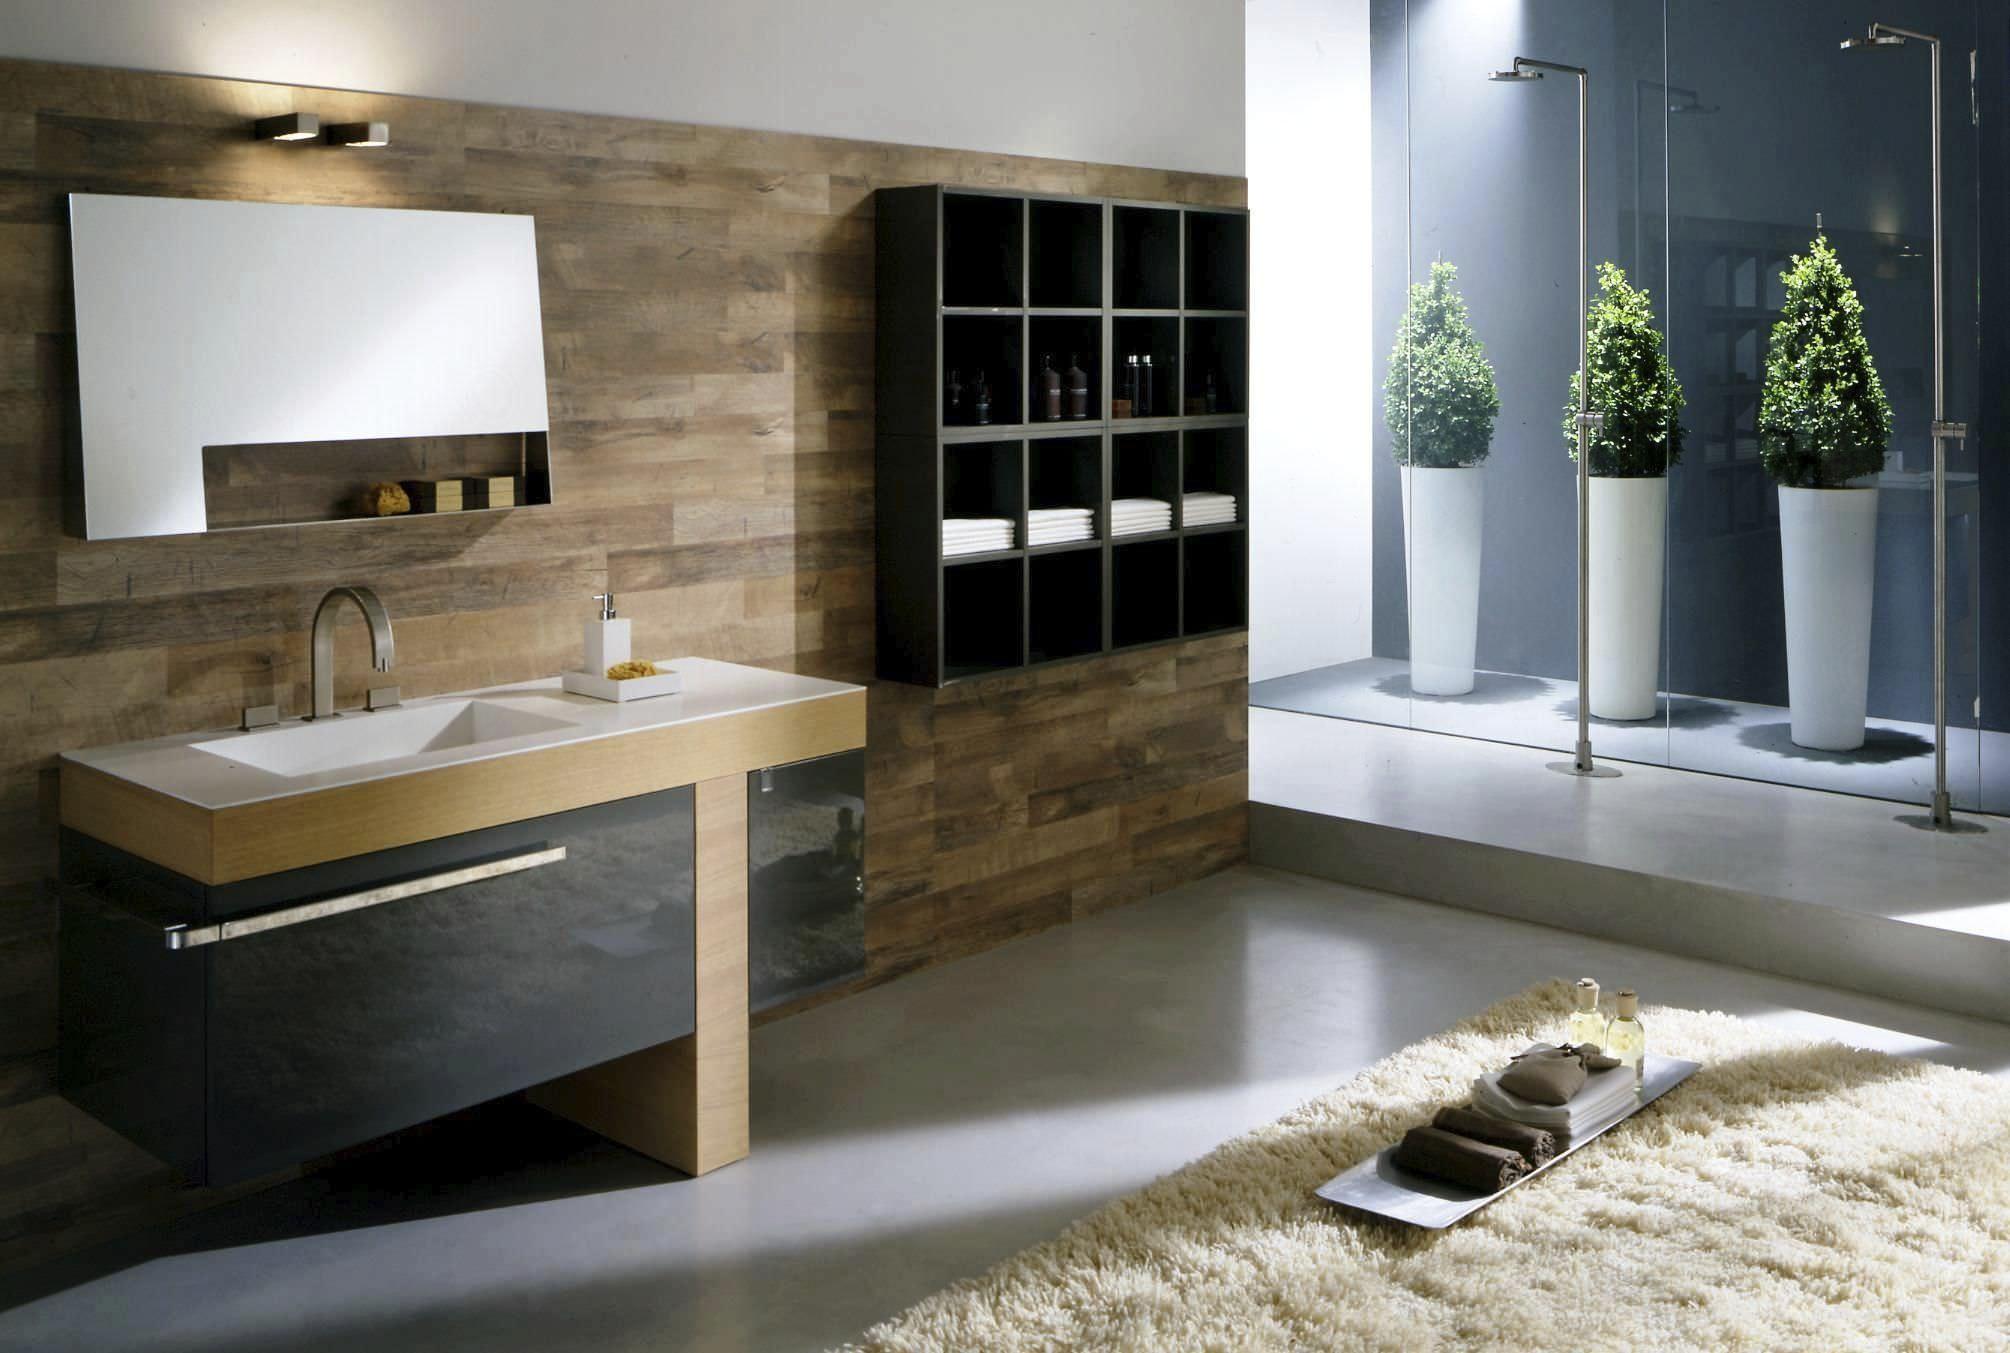 Modern Bathroom Design Ideas 2016 ~ Komplettbad harter energie badkultur leben